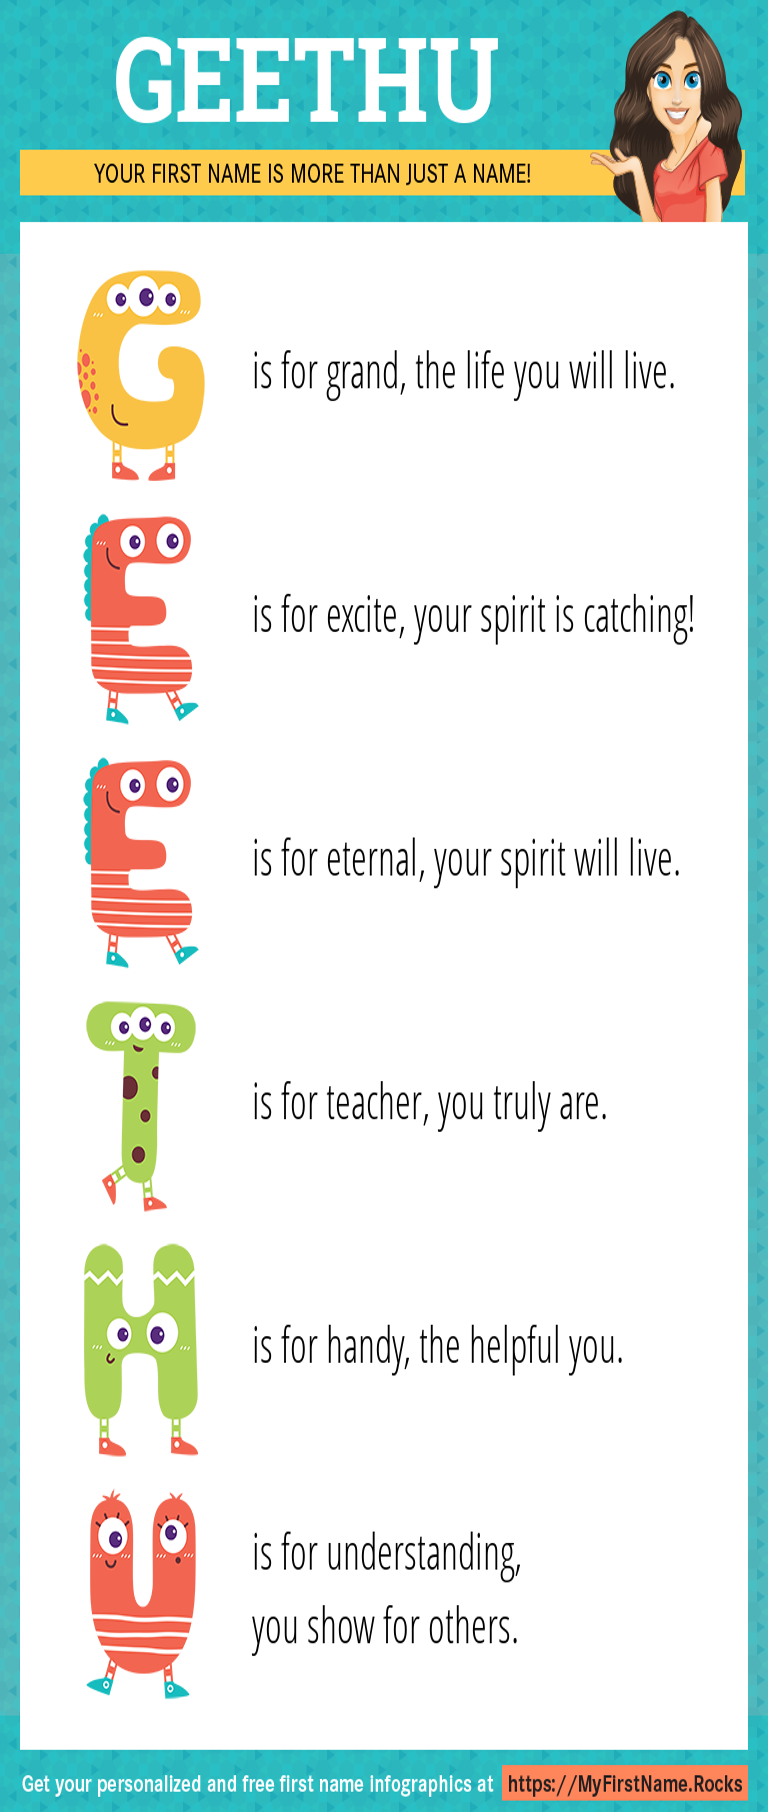 Geethu Infographics